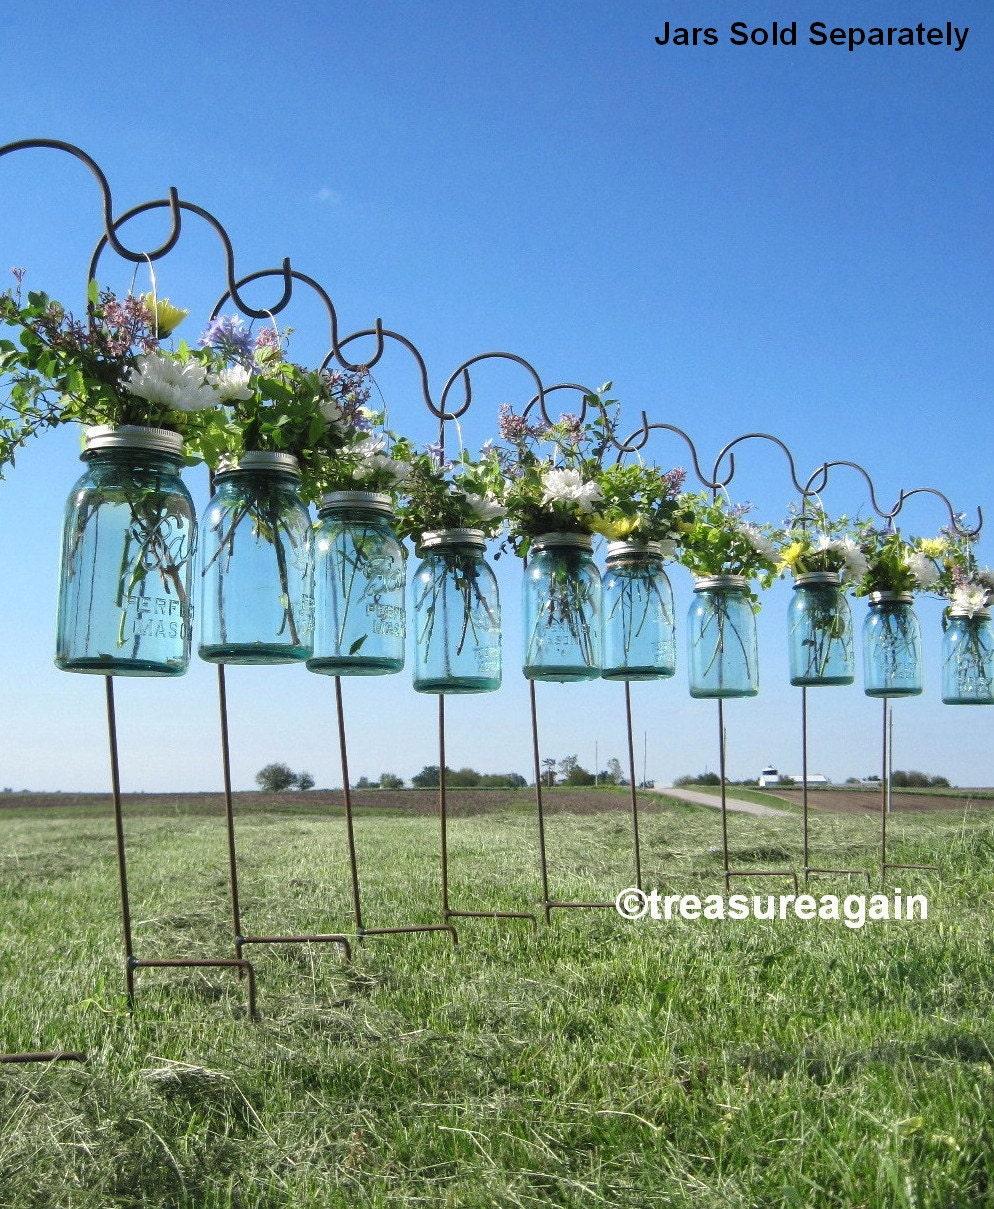 Wedding Flowers In Mason Jars: DIY Hanging Vases Ball Mason Jar Hanging Flower Frog LIDS